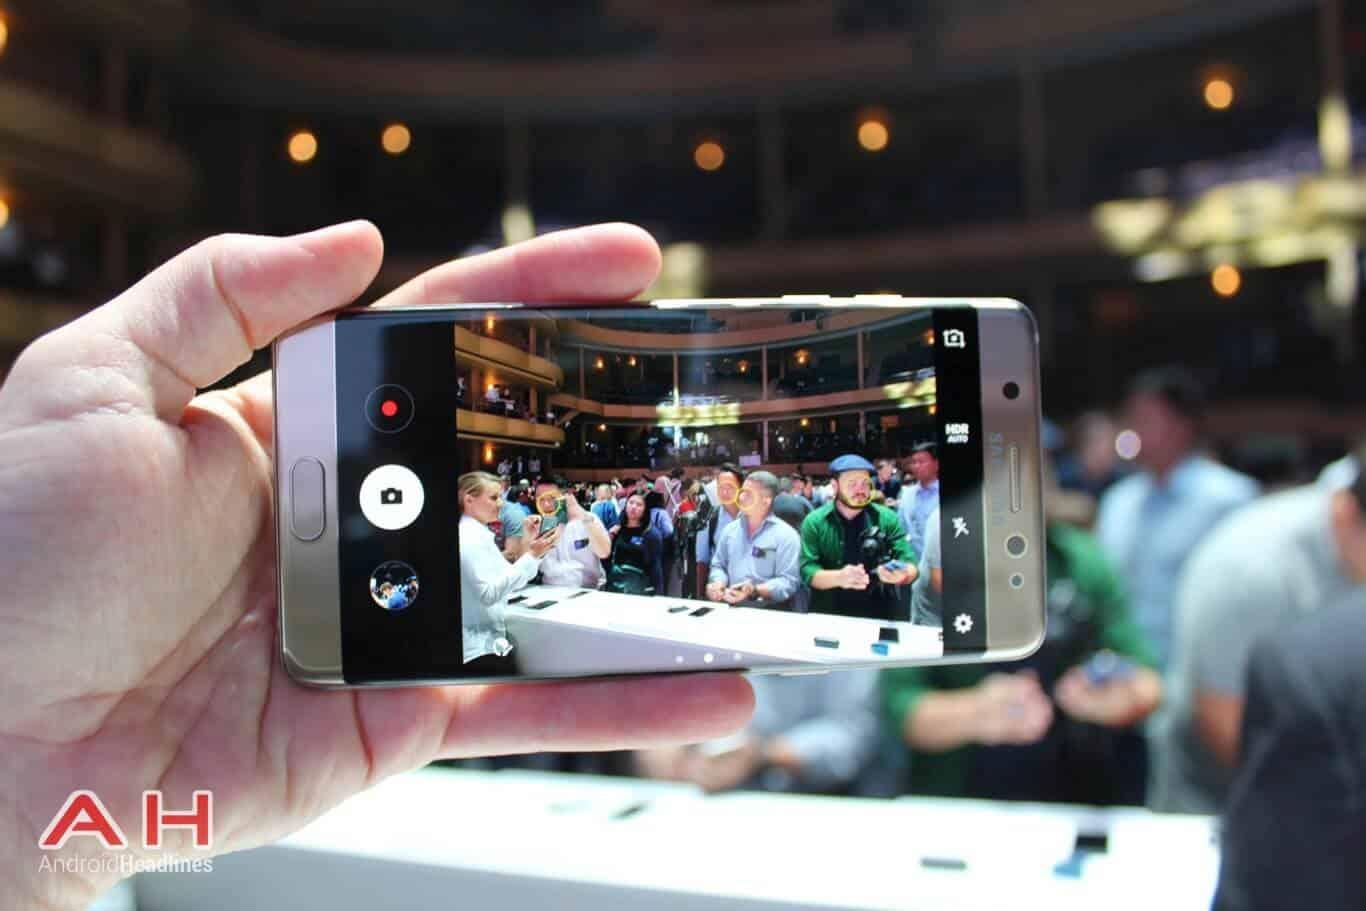 Galaxy Note 7 NS AH 31